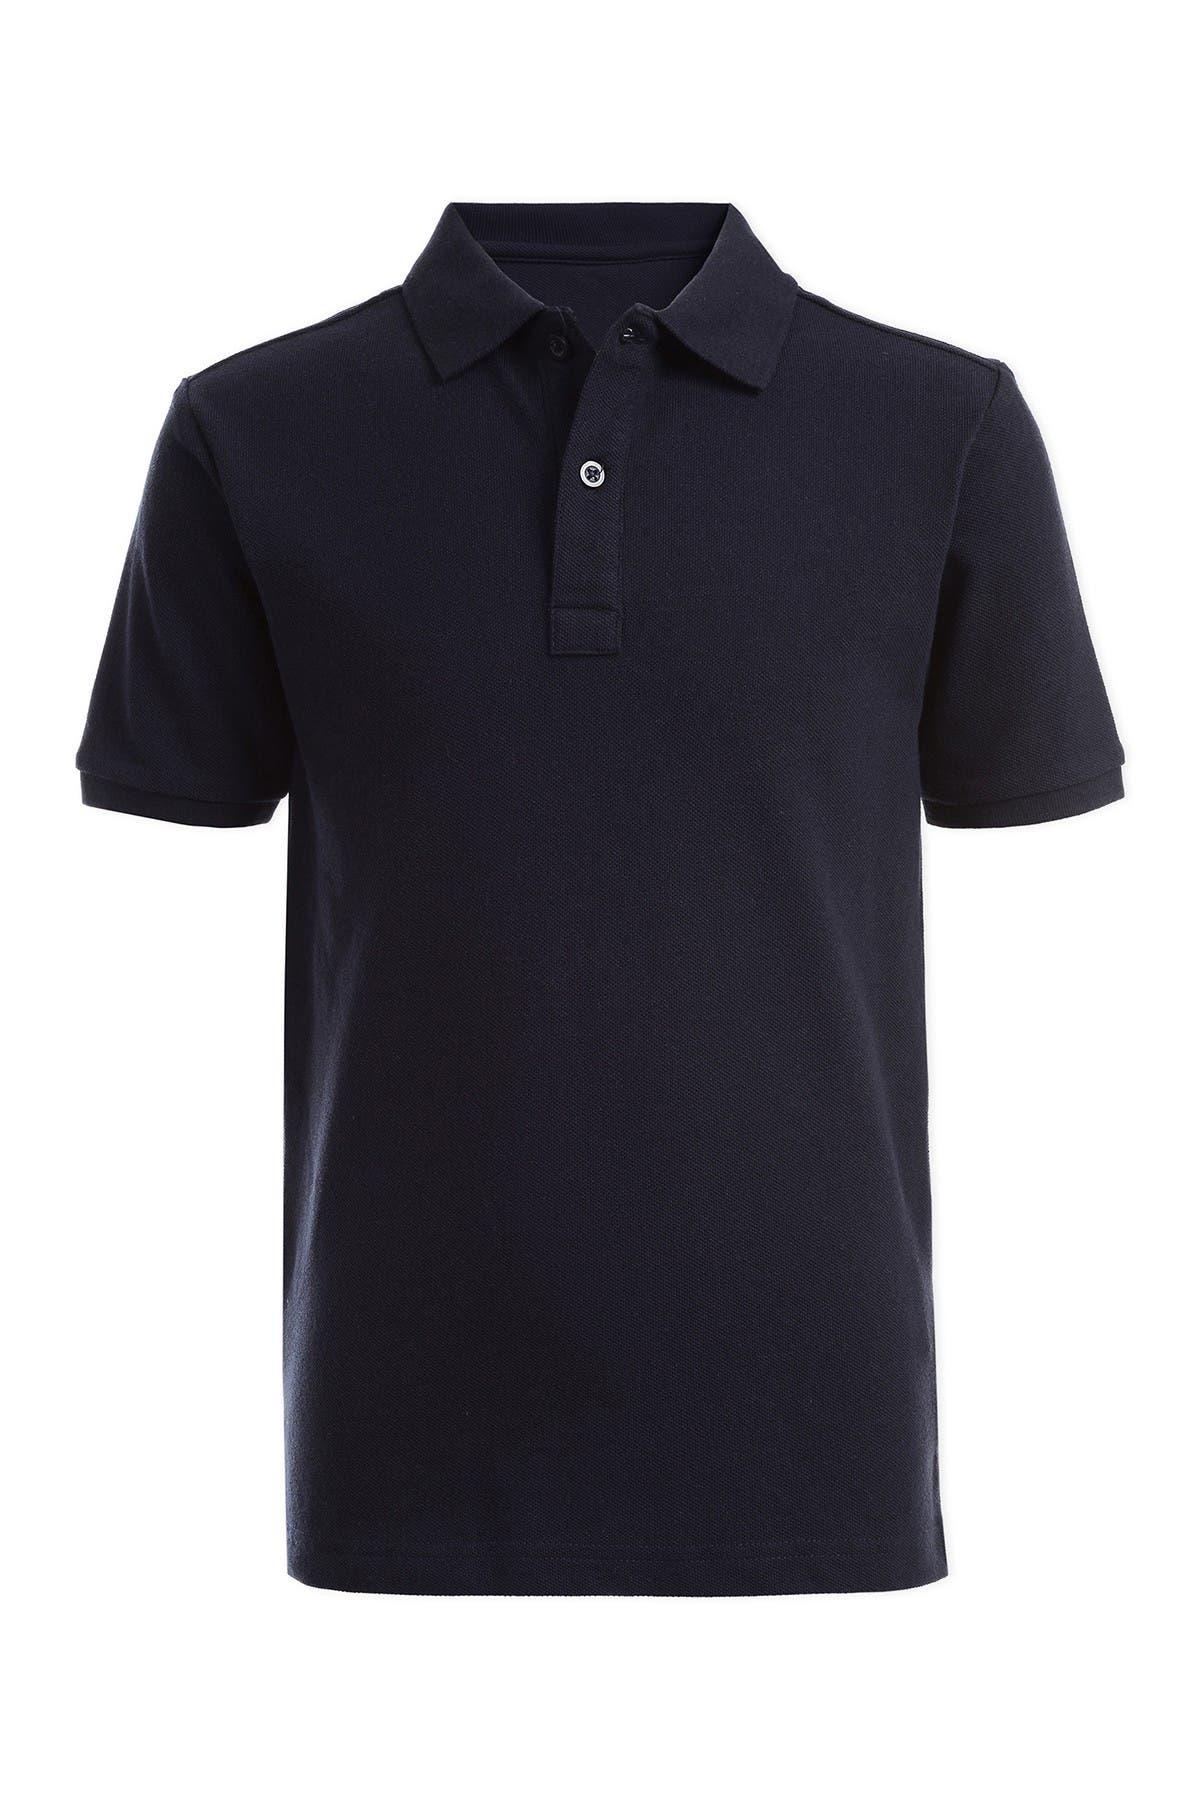 Image of Nautica Short Sleeve Double Pique Polo Uniform Shirt